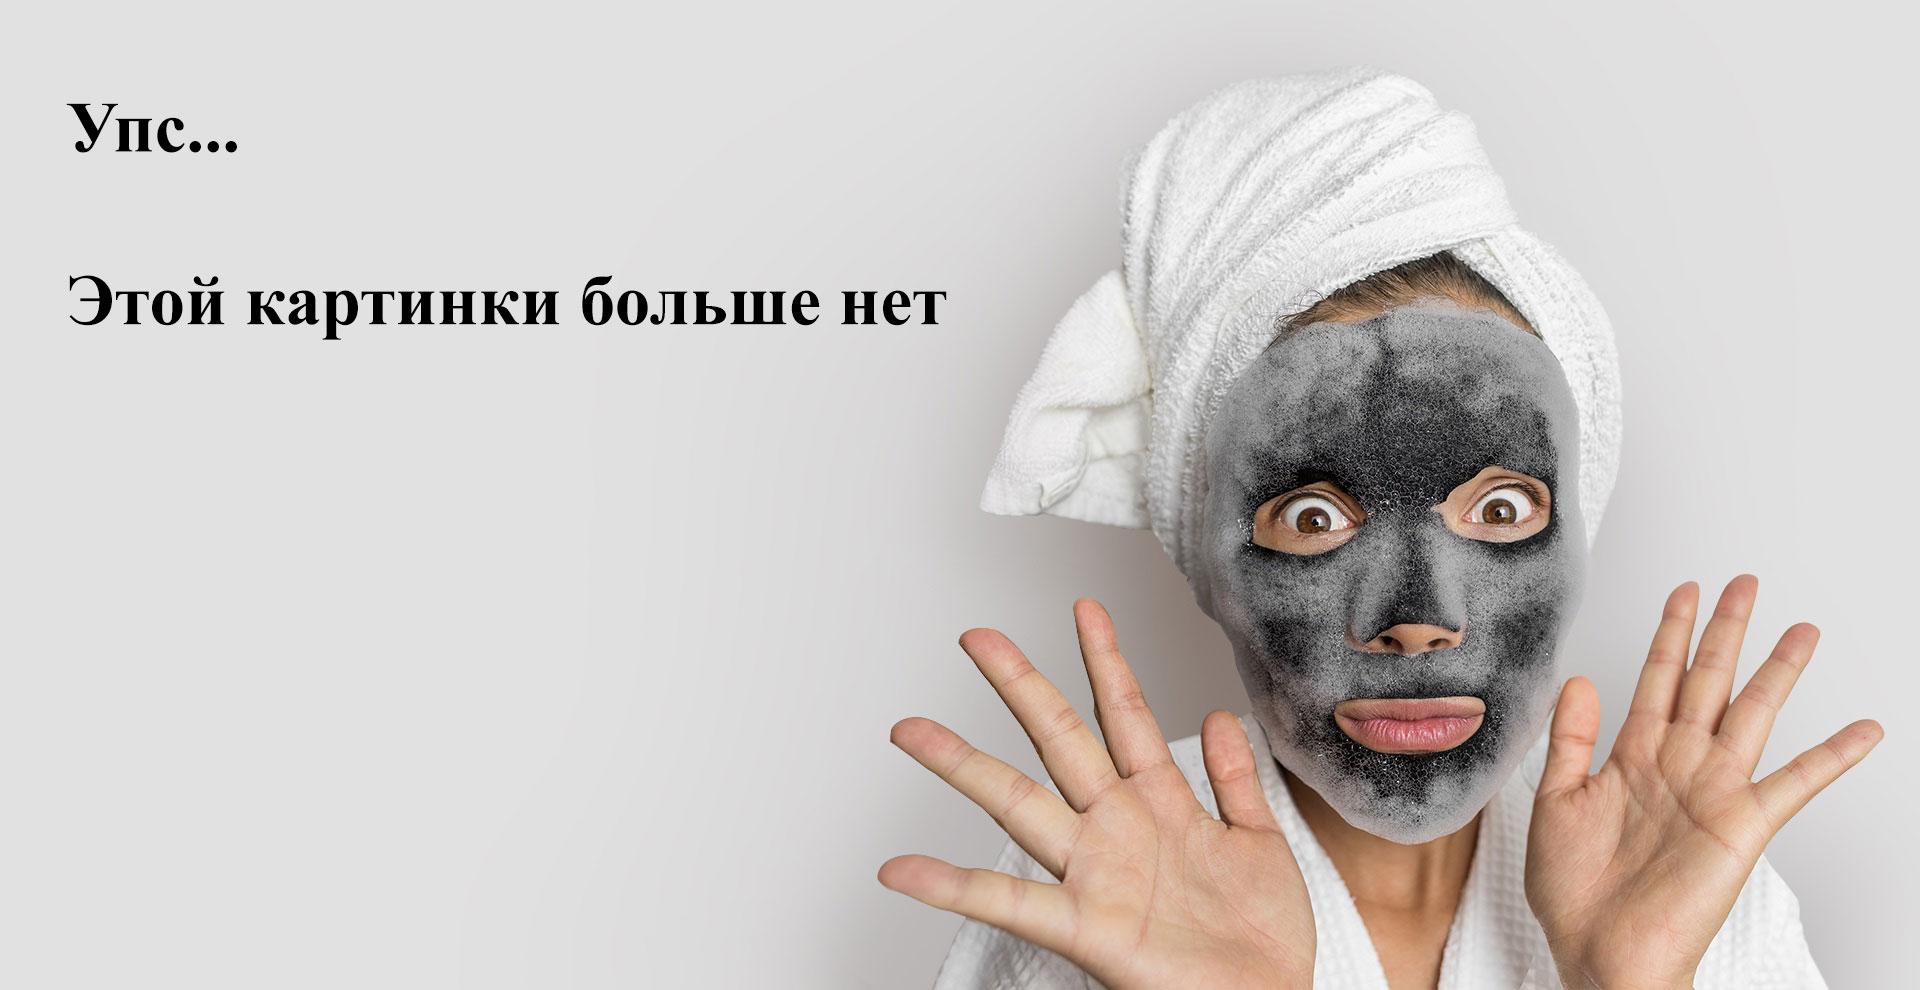 Vogue Nails, Гель-лак Кошачий глаз Меркурий